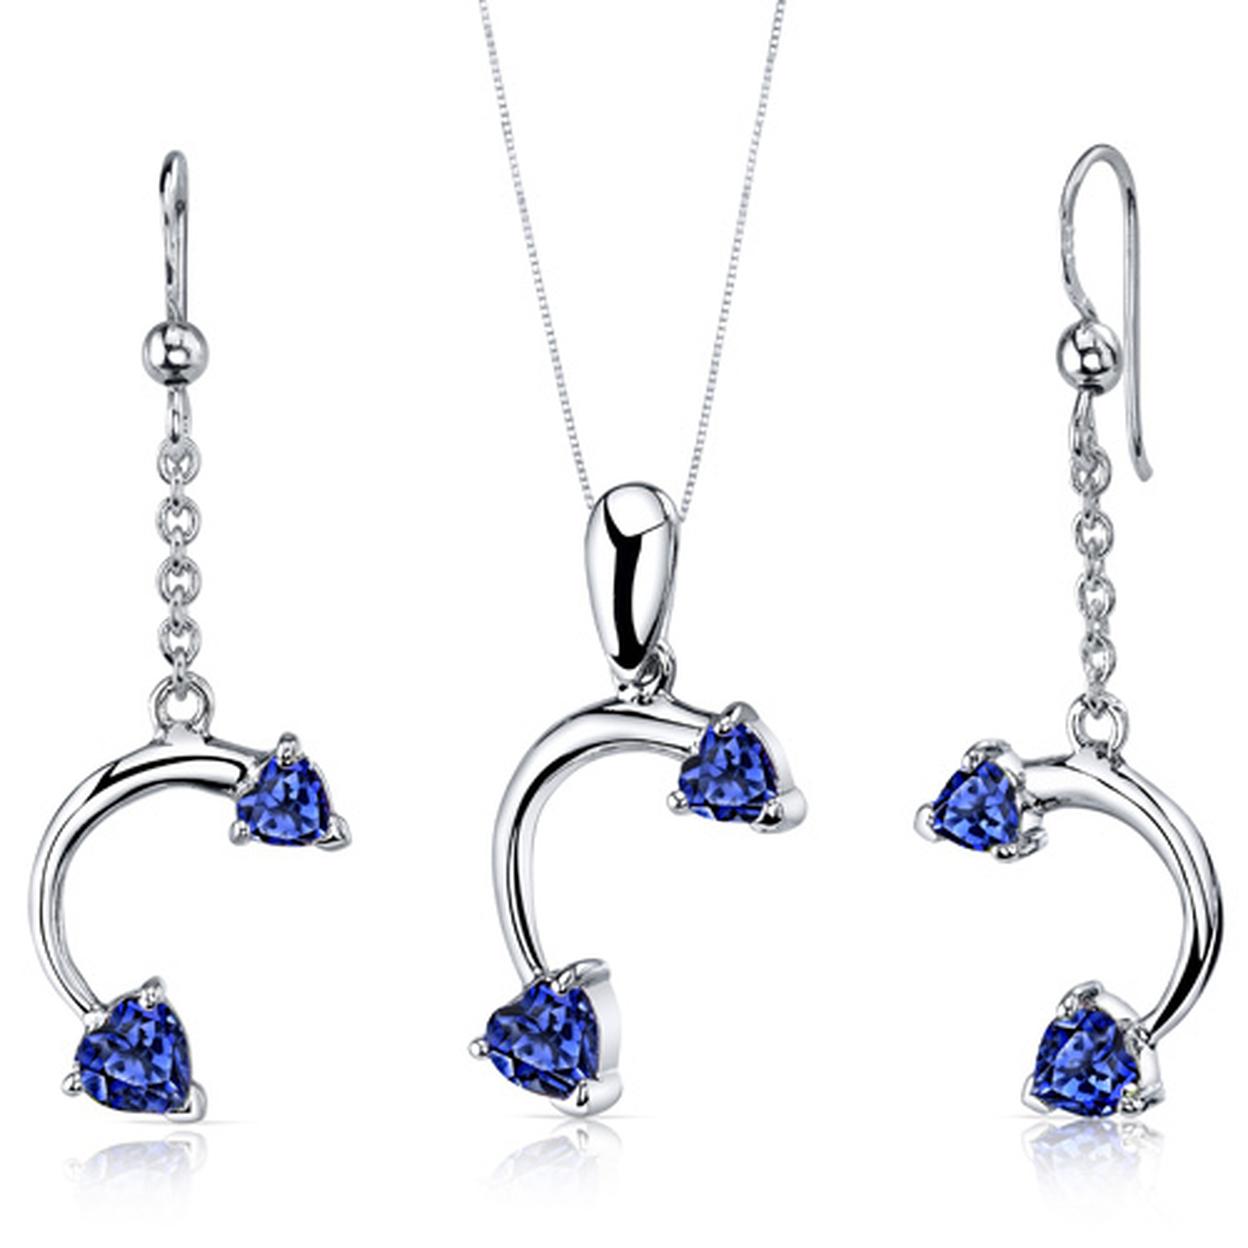 Love Duet 2.25 Carats Heart Shape Sterling Silver Sapphire Pendant Earrings Set Style Ss3738